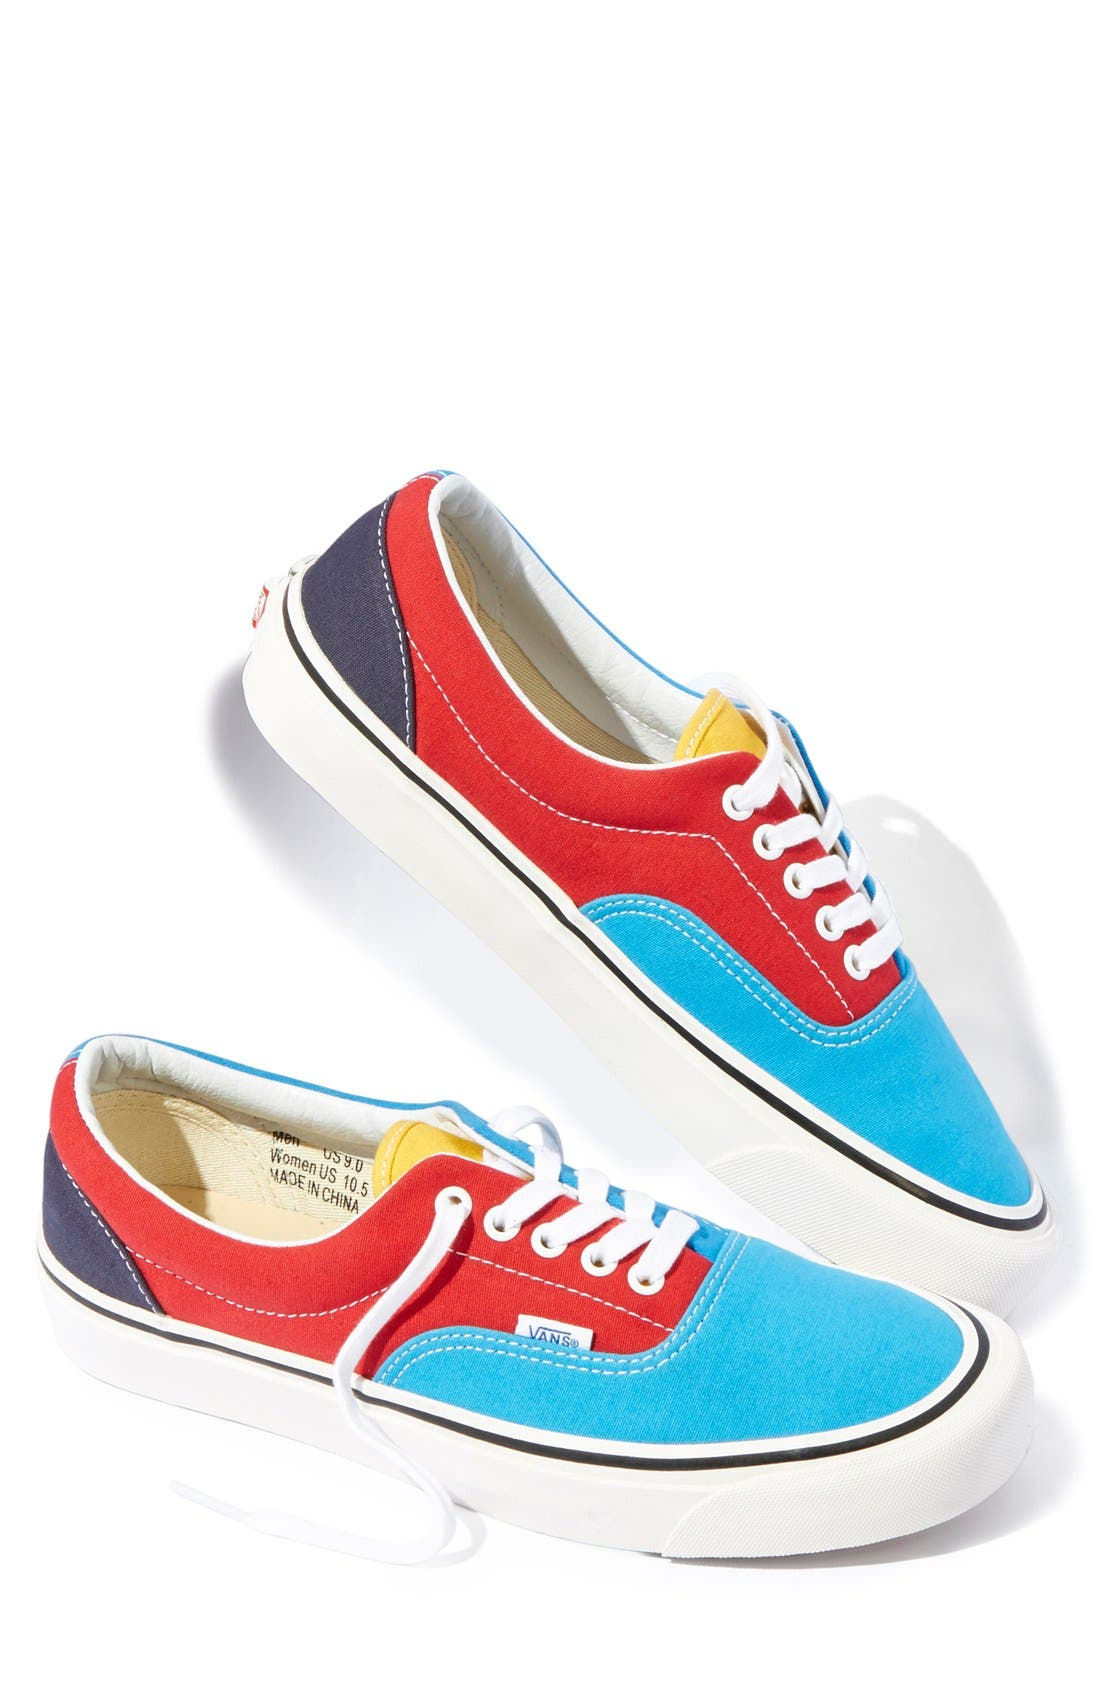 '50th Era 95 Reissue' Low Top Skate Sneaker, Main, color, 001